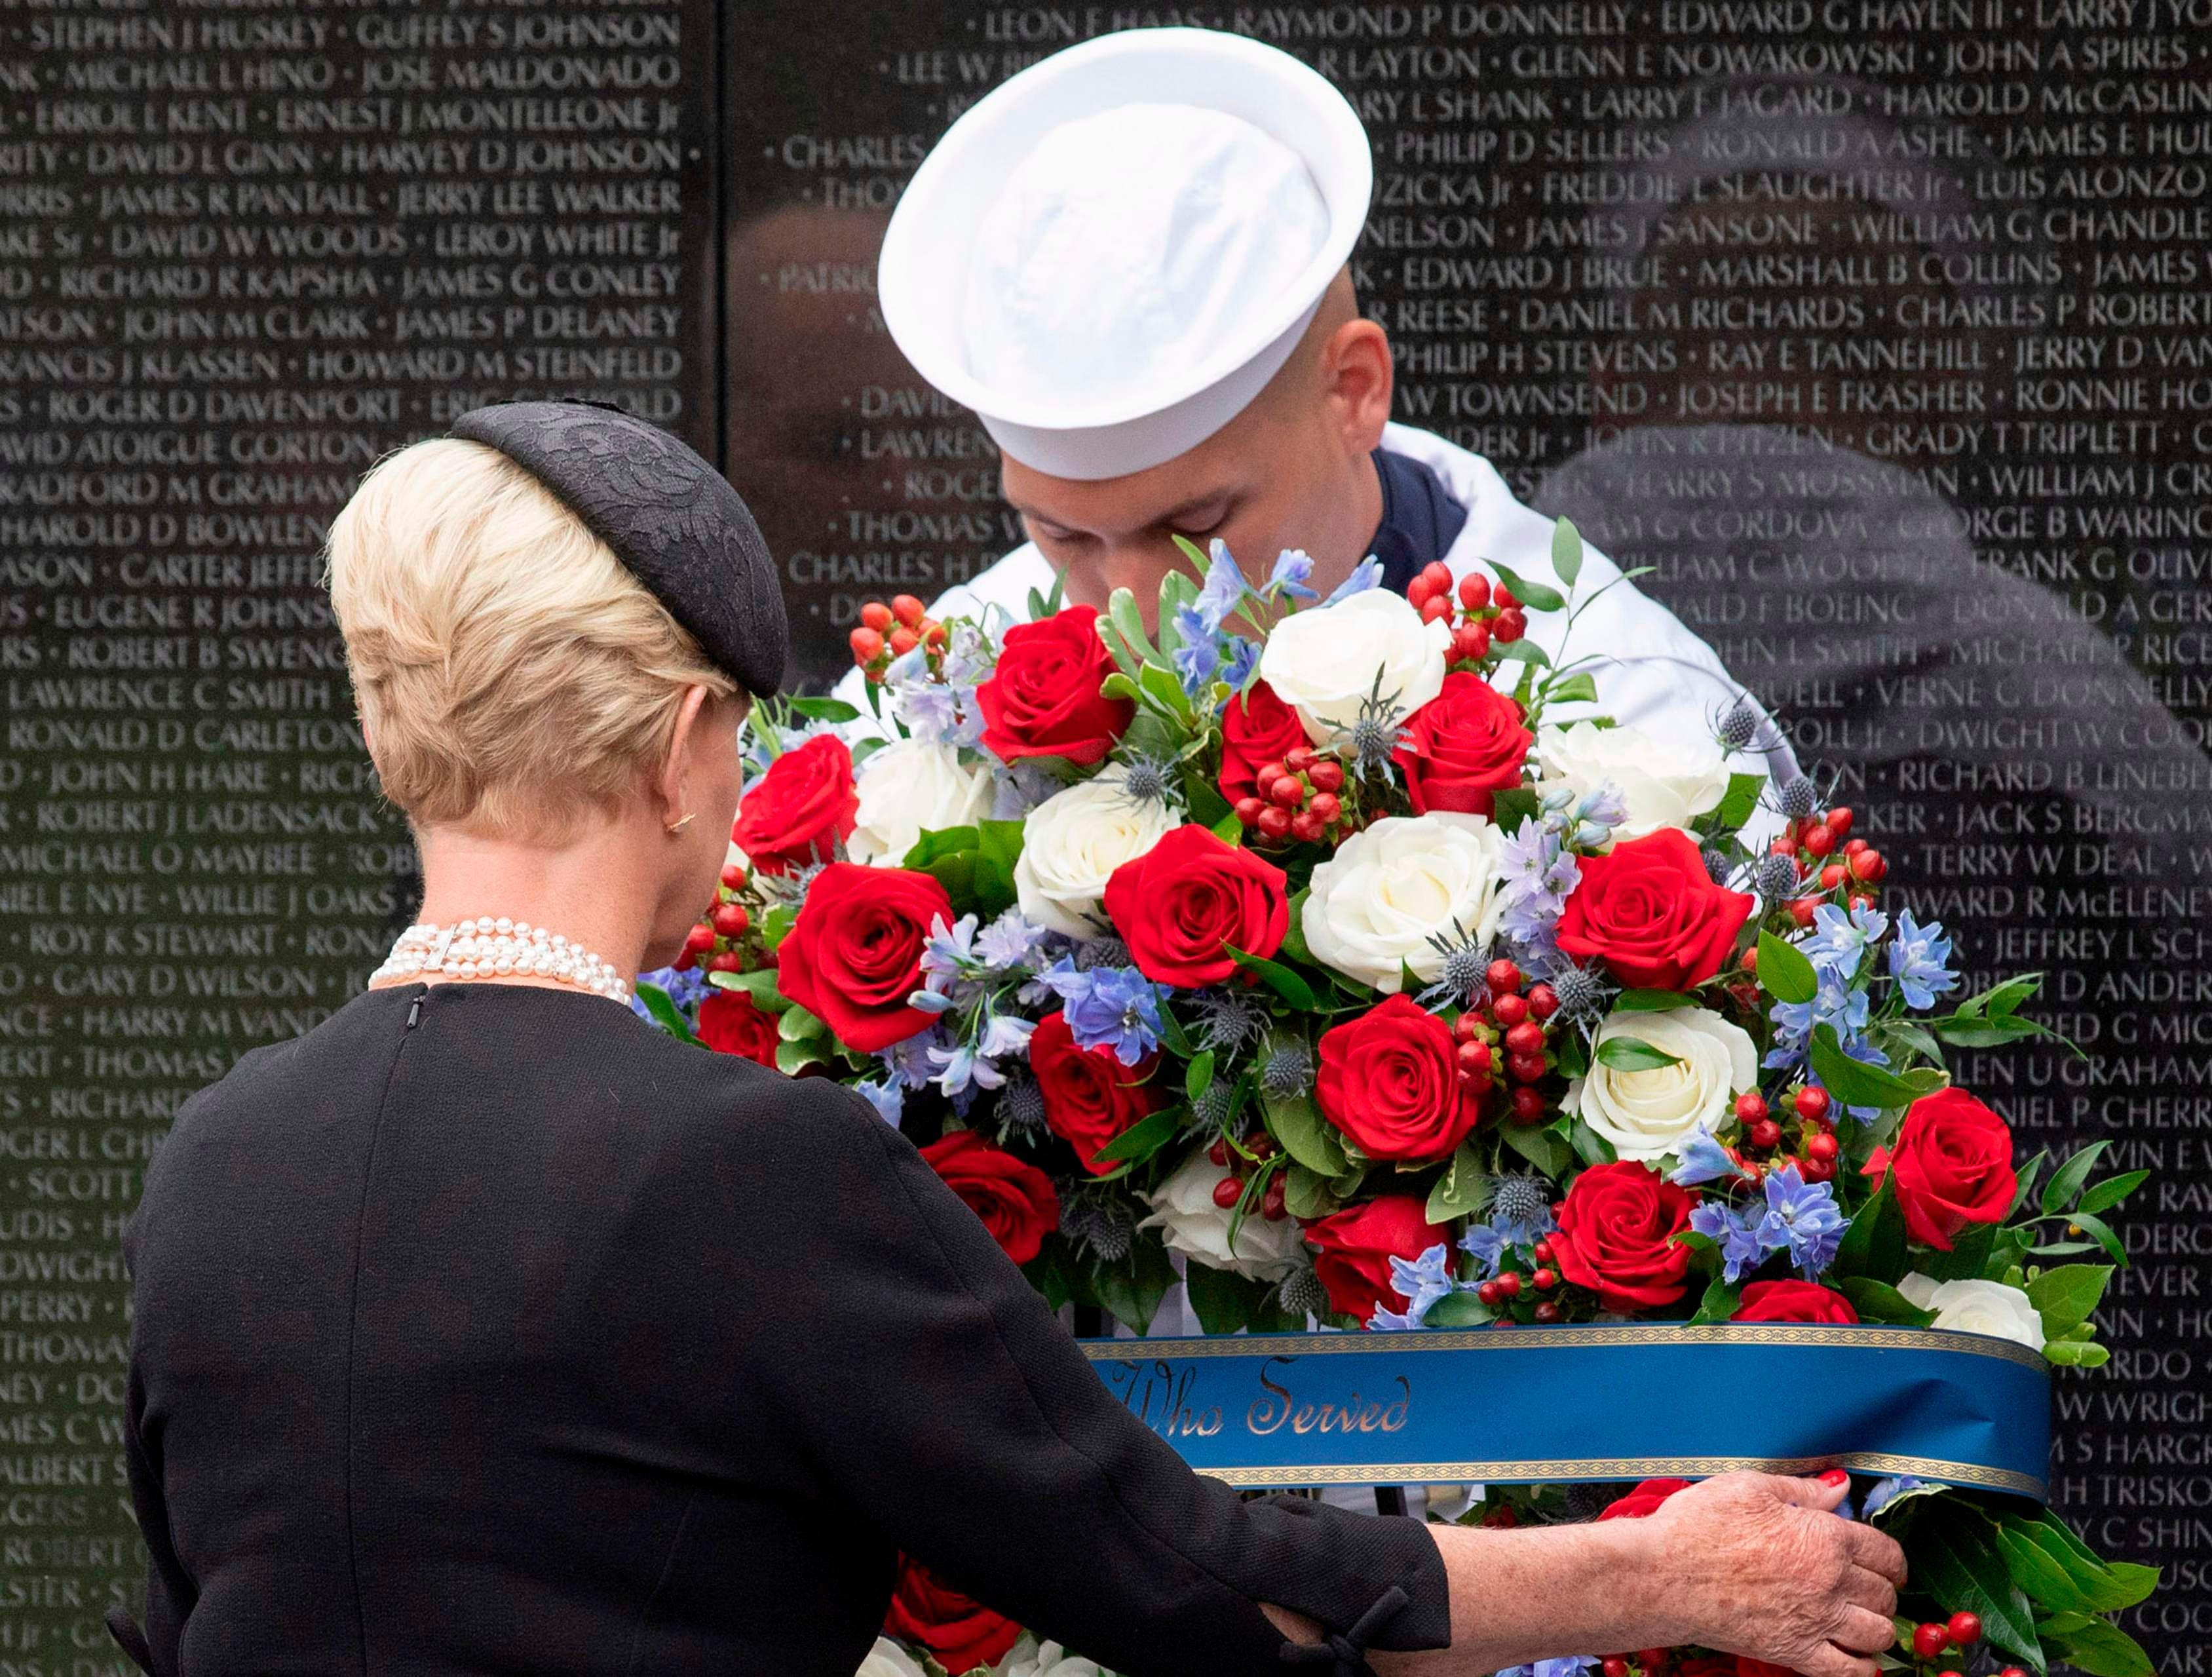 Cindy McCain , wife of US Senator John McCain, lays a wreath at the Vietnam Veterans Memorial, in Washington, DC.